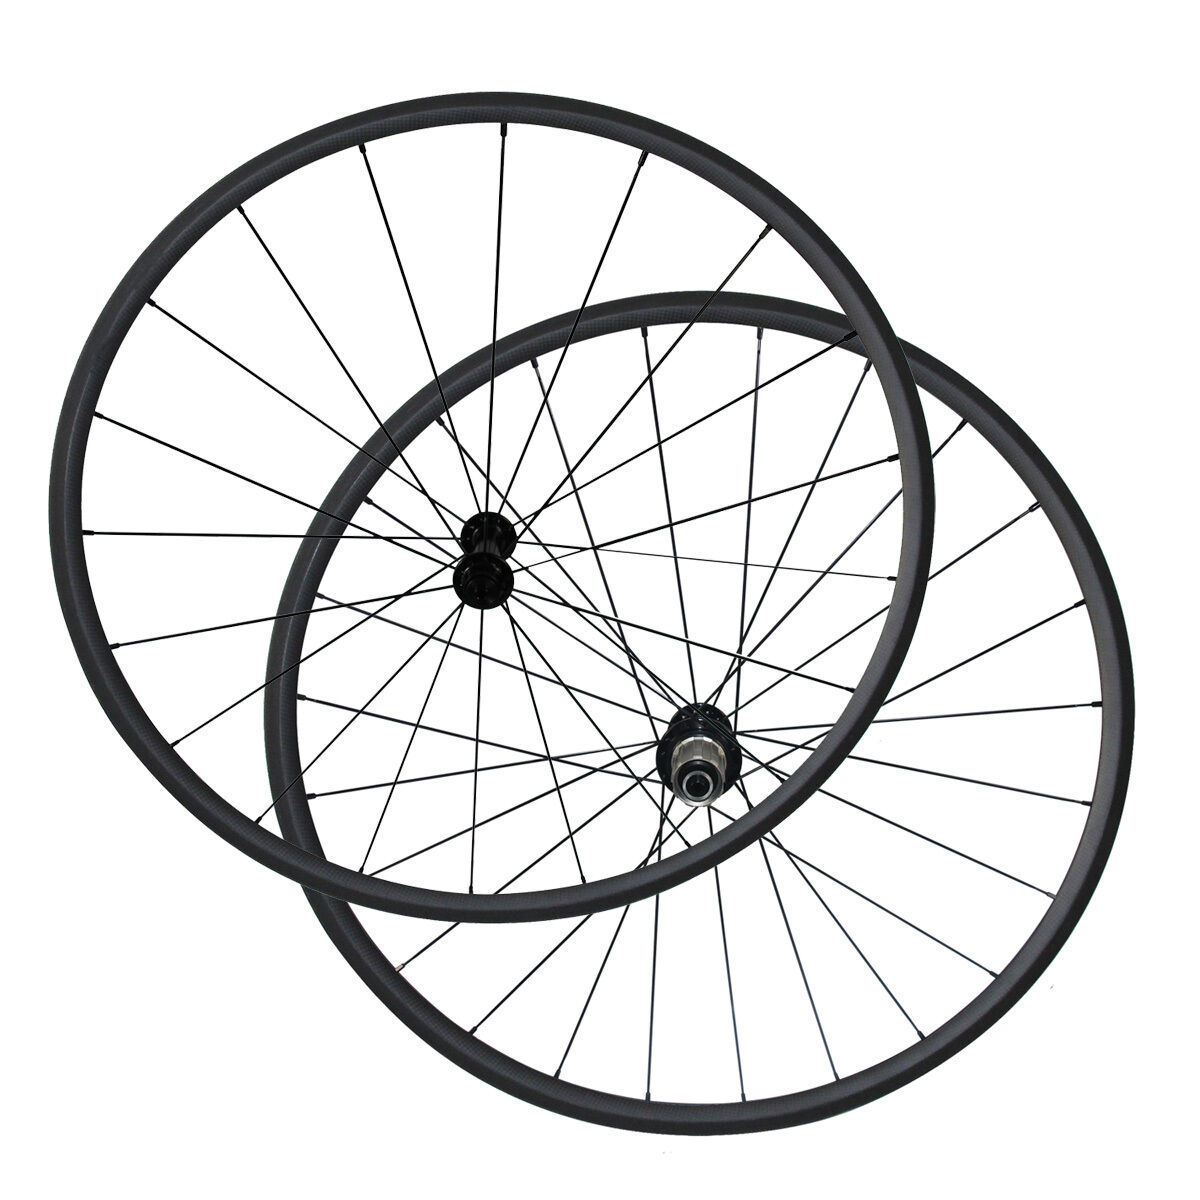 1280g 24mm Clincher carbon bicycle wheels R13 CN424 spokes Carbon bike wheelset